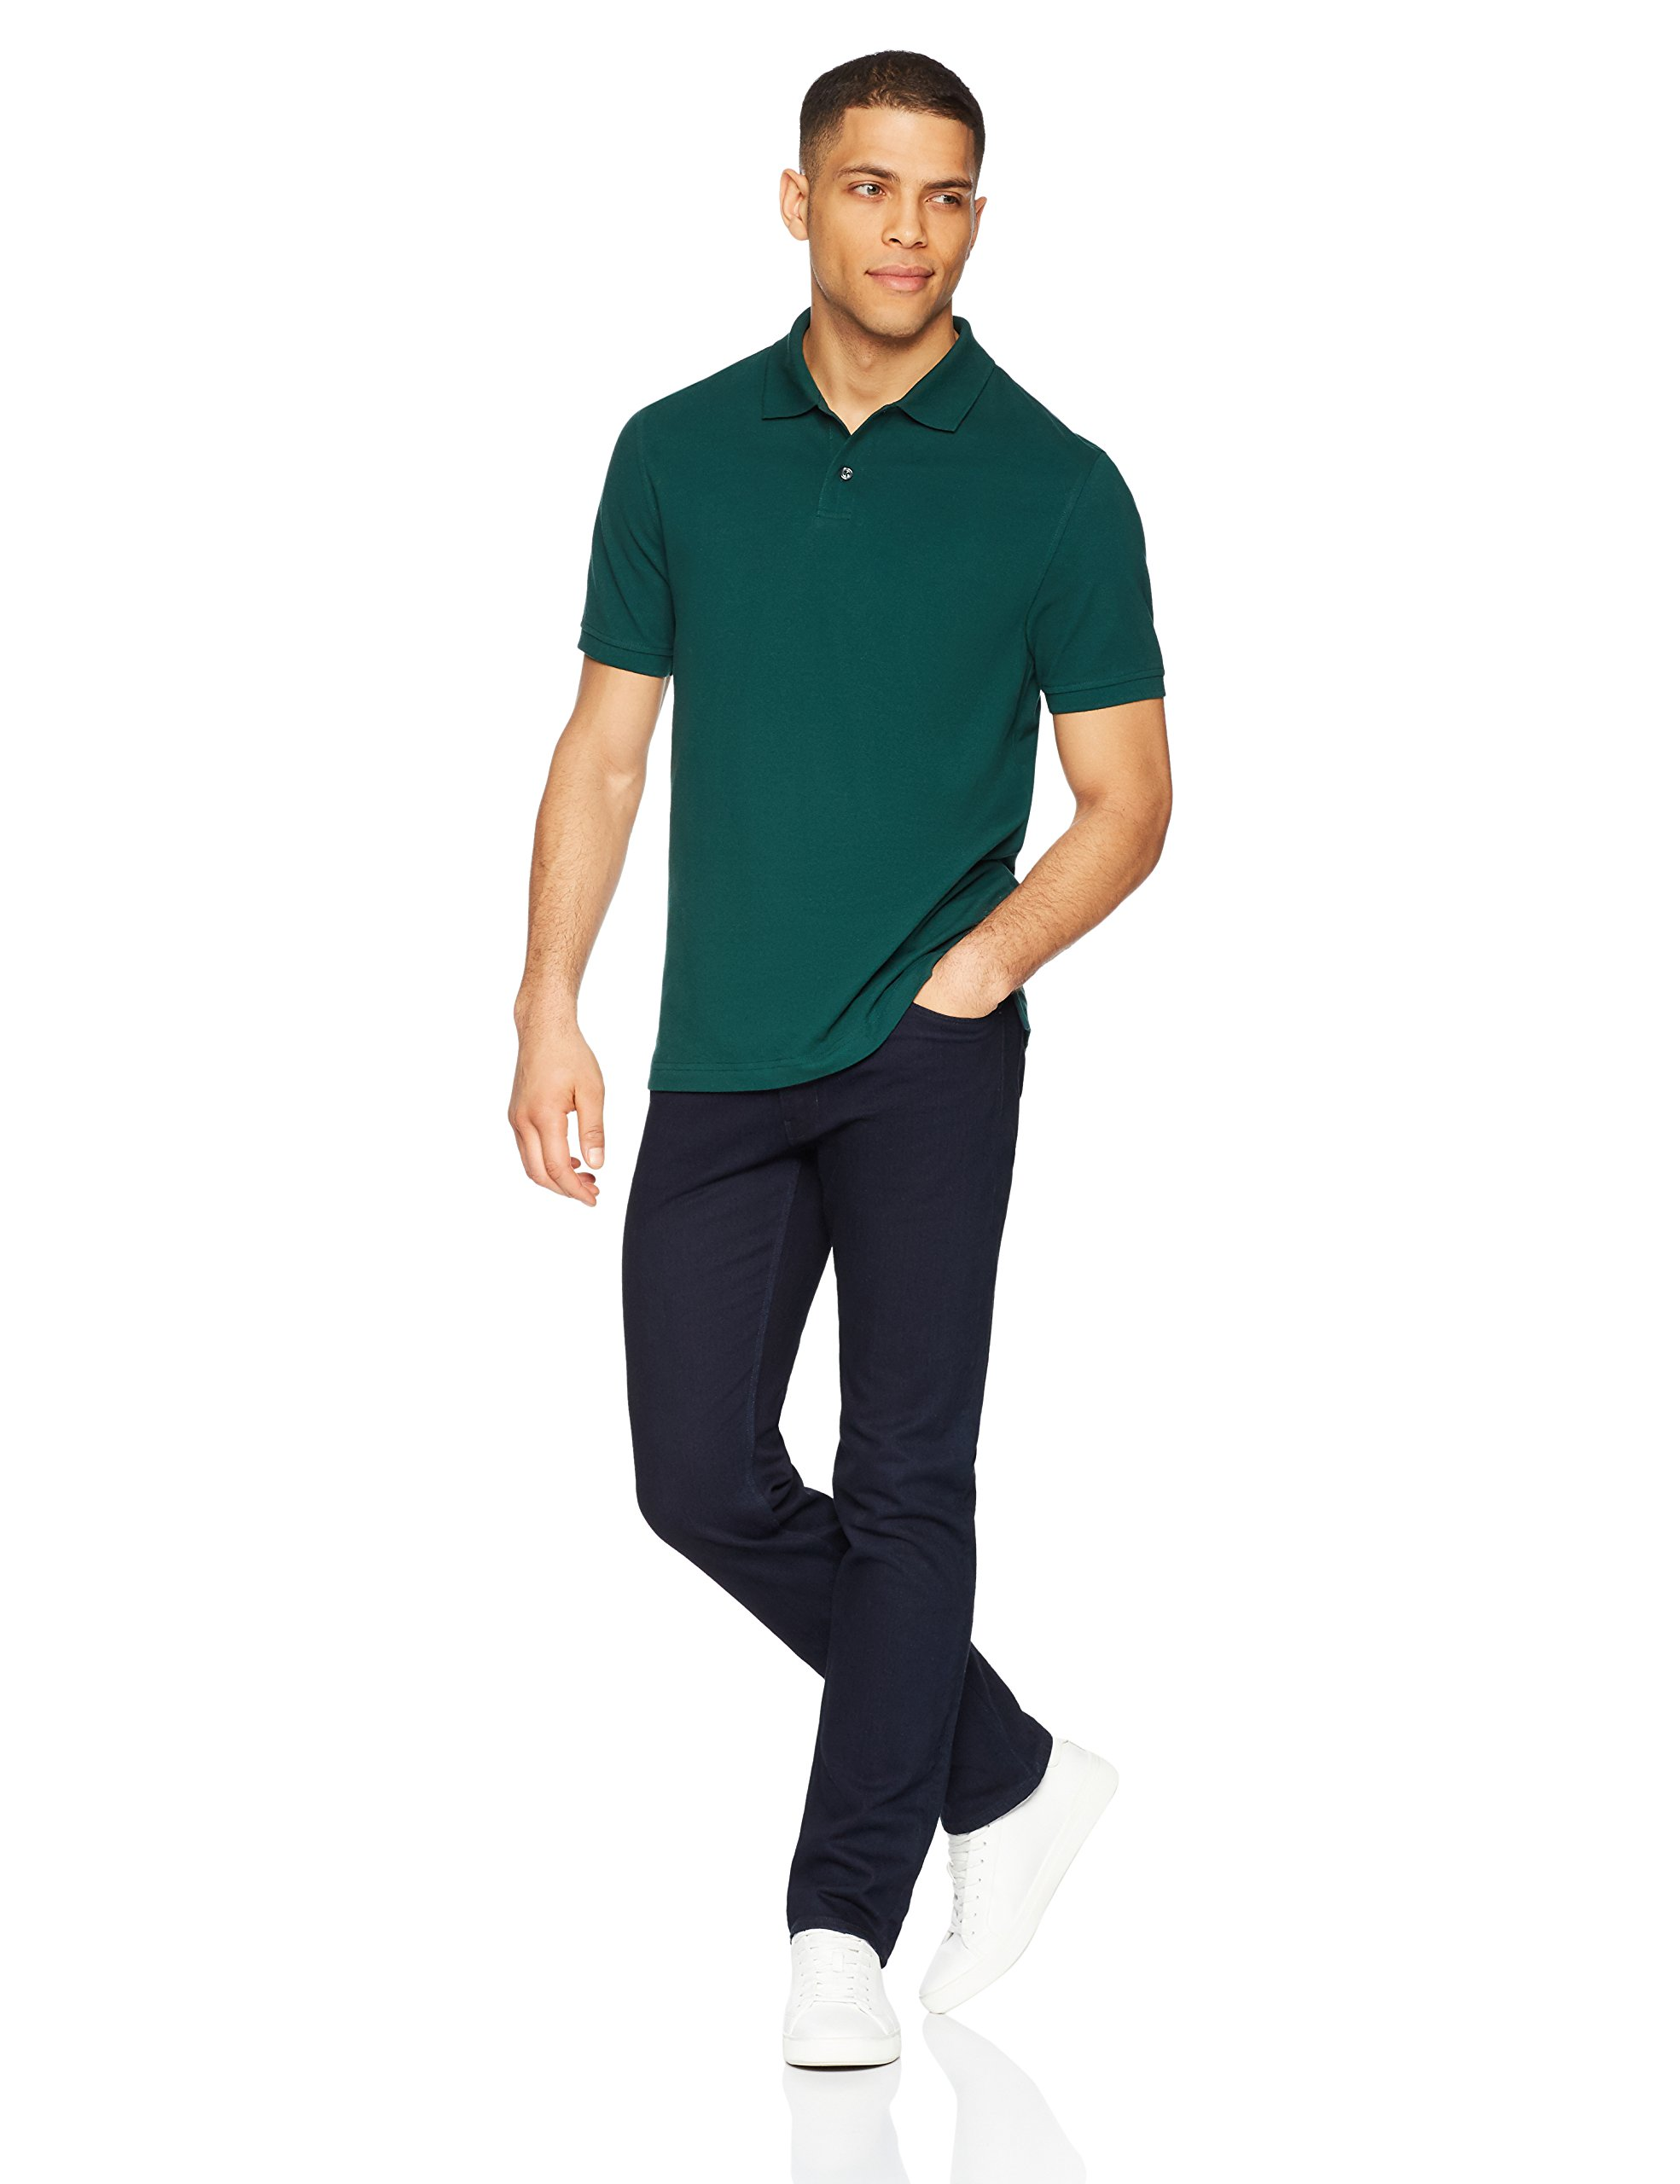 Amazon Essentials Men's Slim-Fit Cotton Pique Polo Shirt, Hunter Green, Large by Amazon Essentials (Image #2)